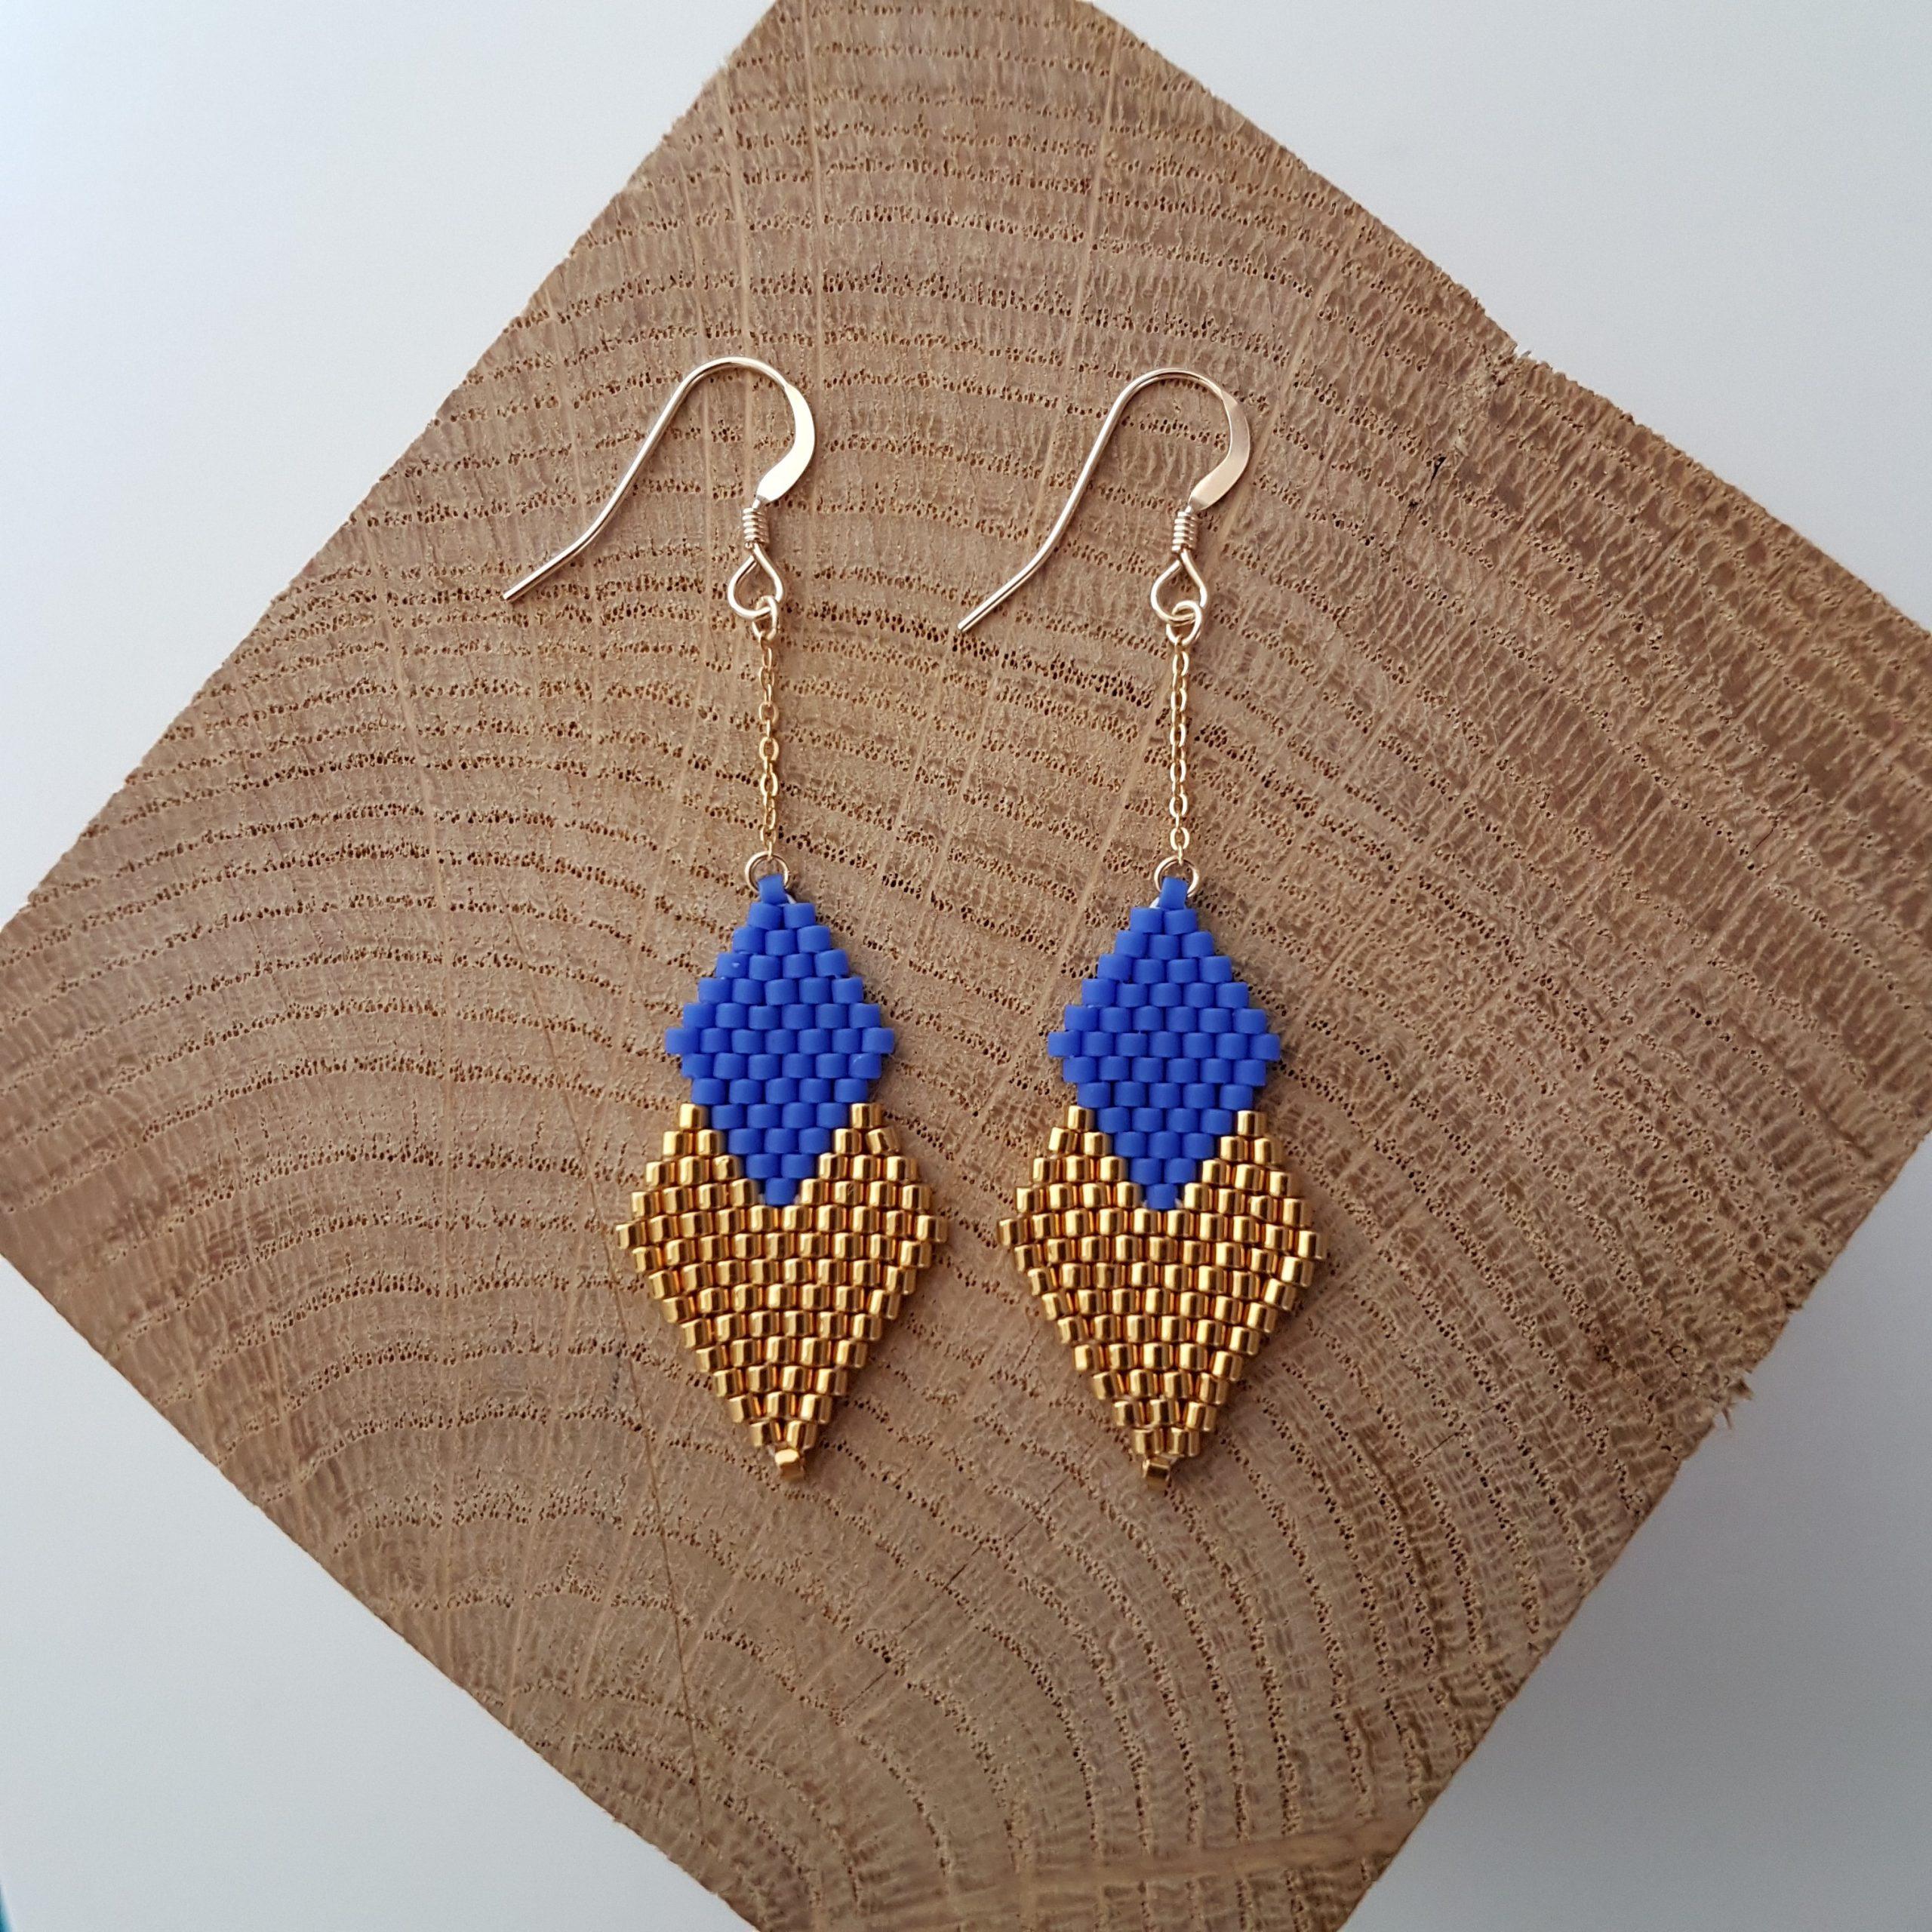 Boucles d'oreilles PENELOPE mini [bleu roi]